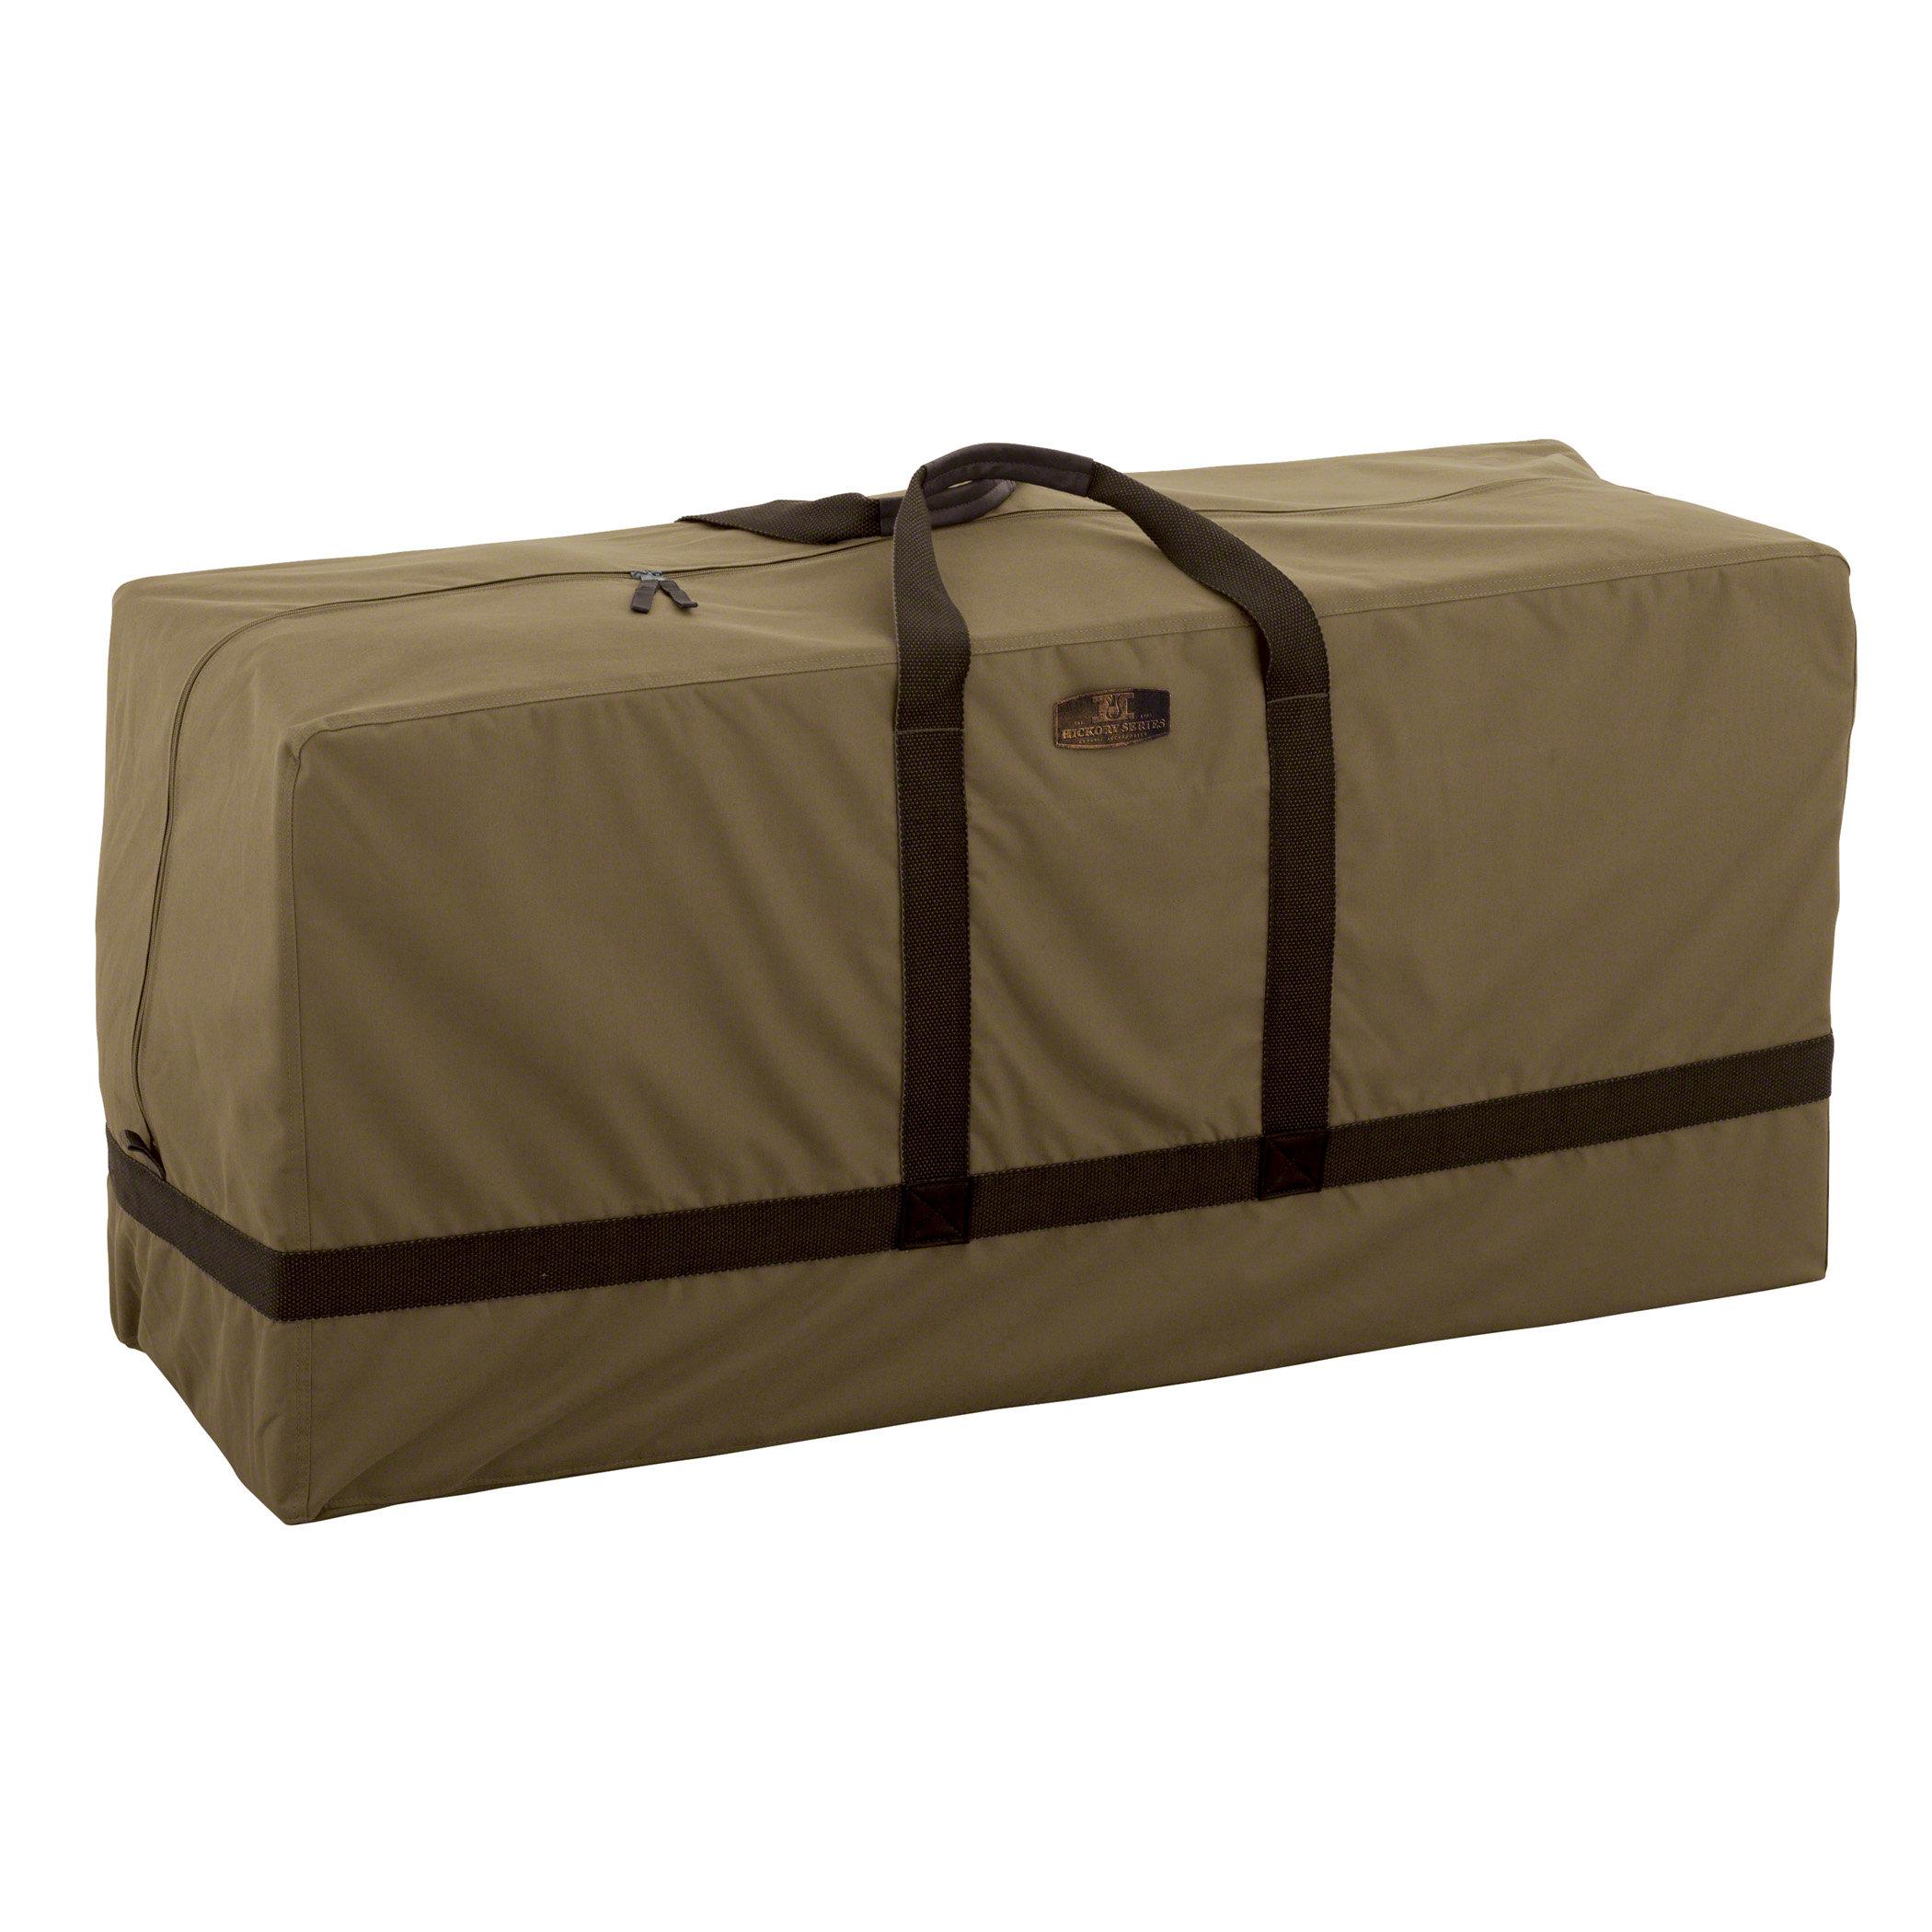 classic accessories 55 211 012401 ec hickory